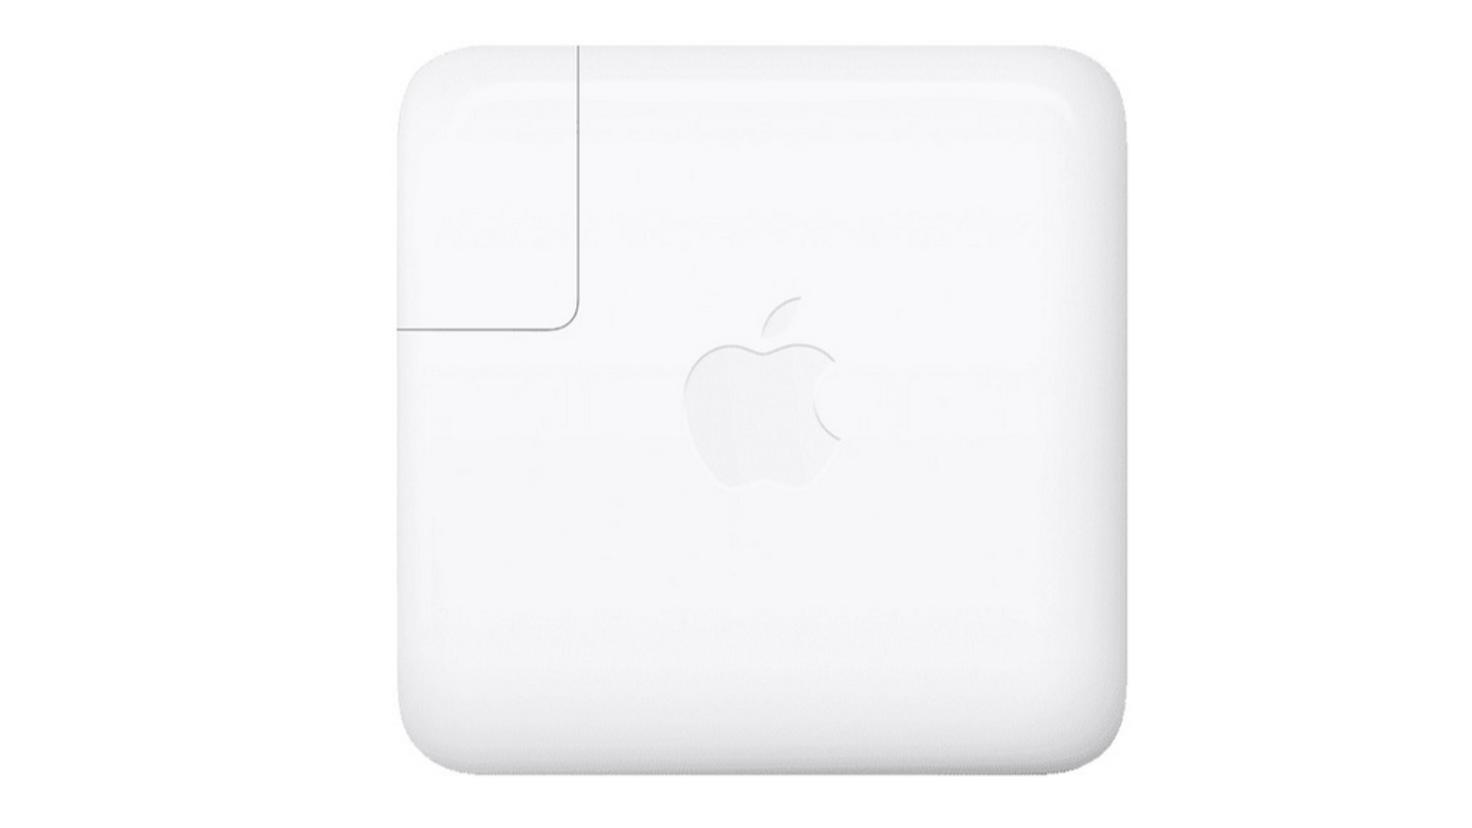 Apple-USB-C-Netzteil